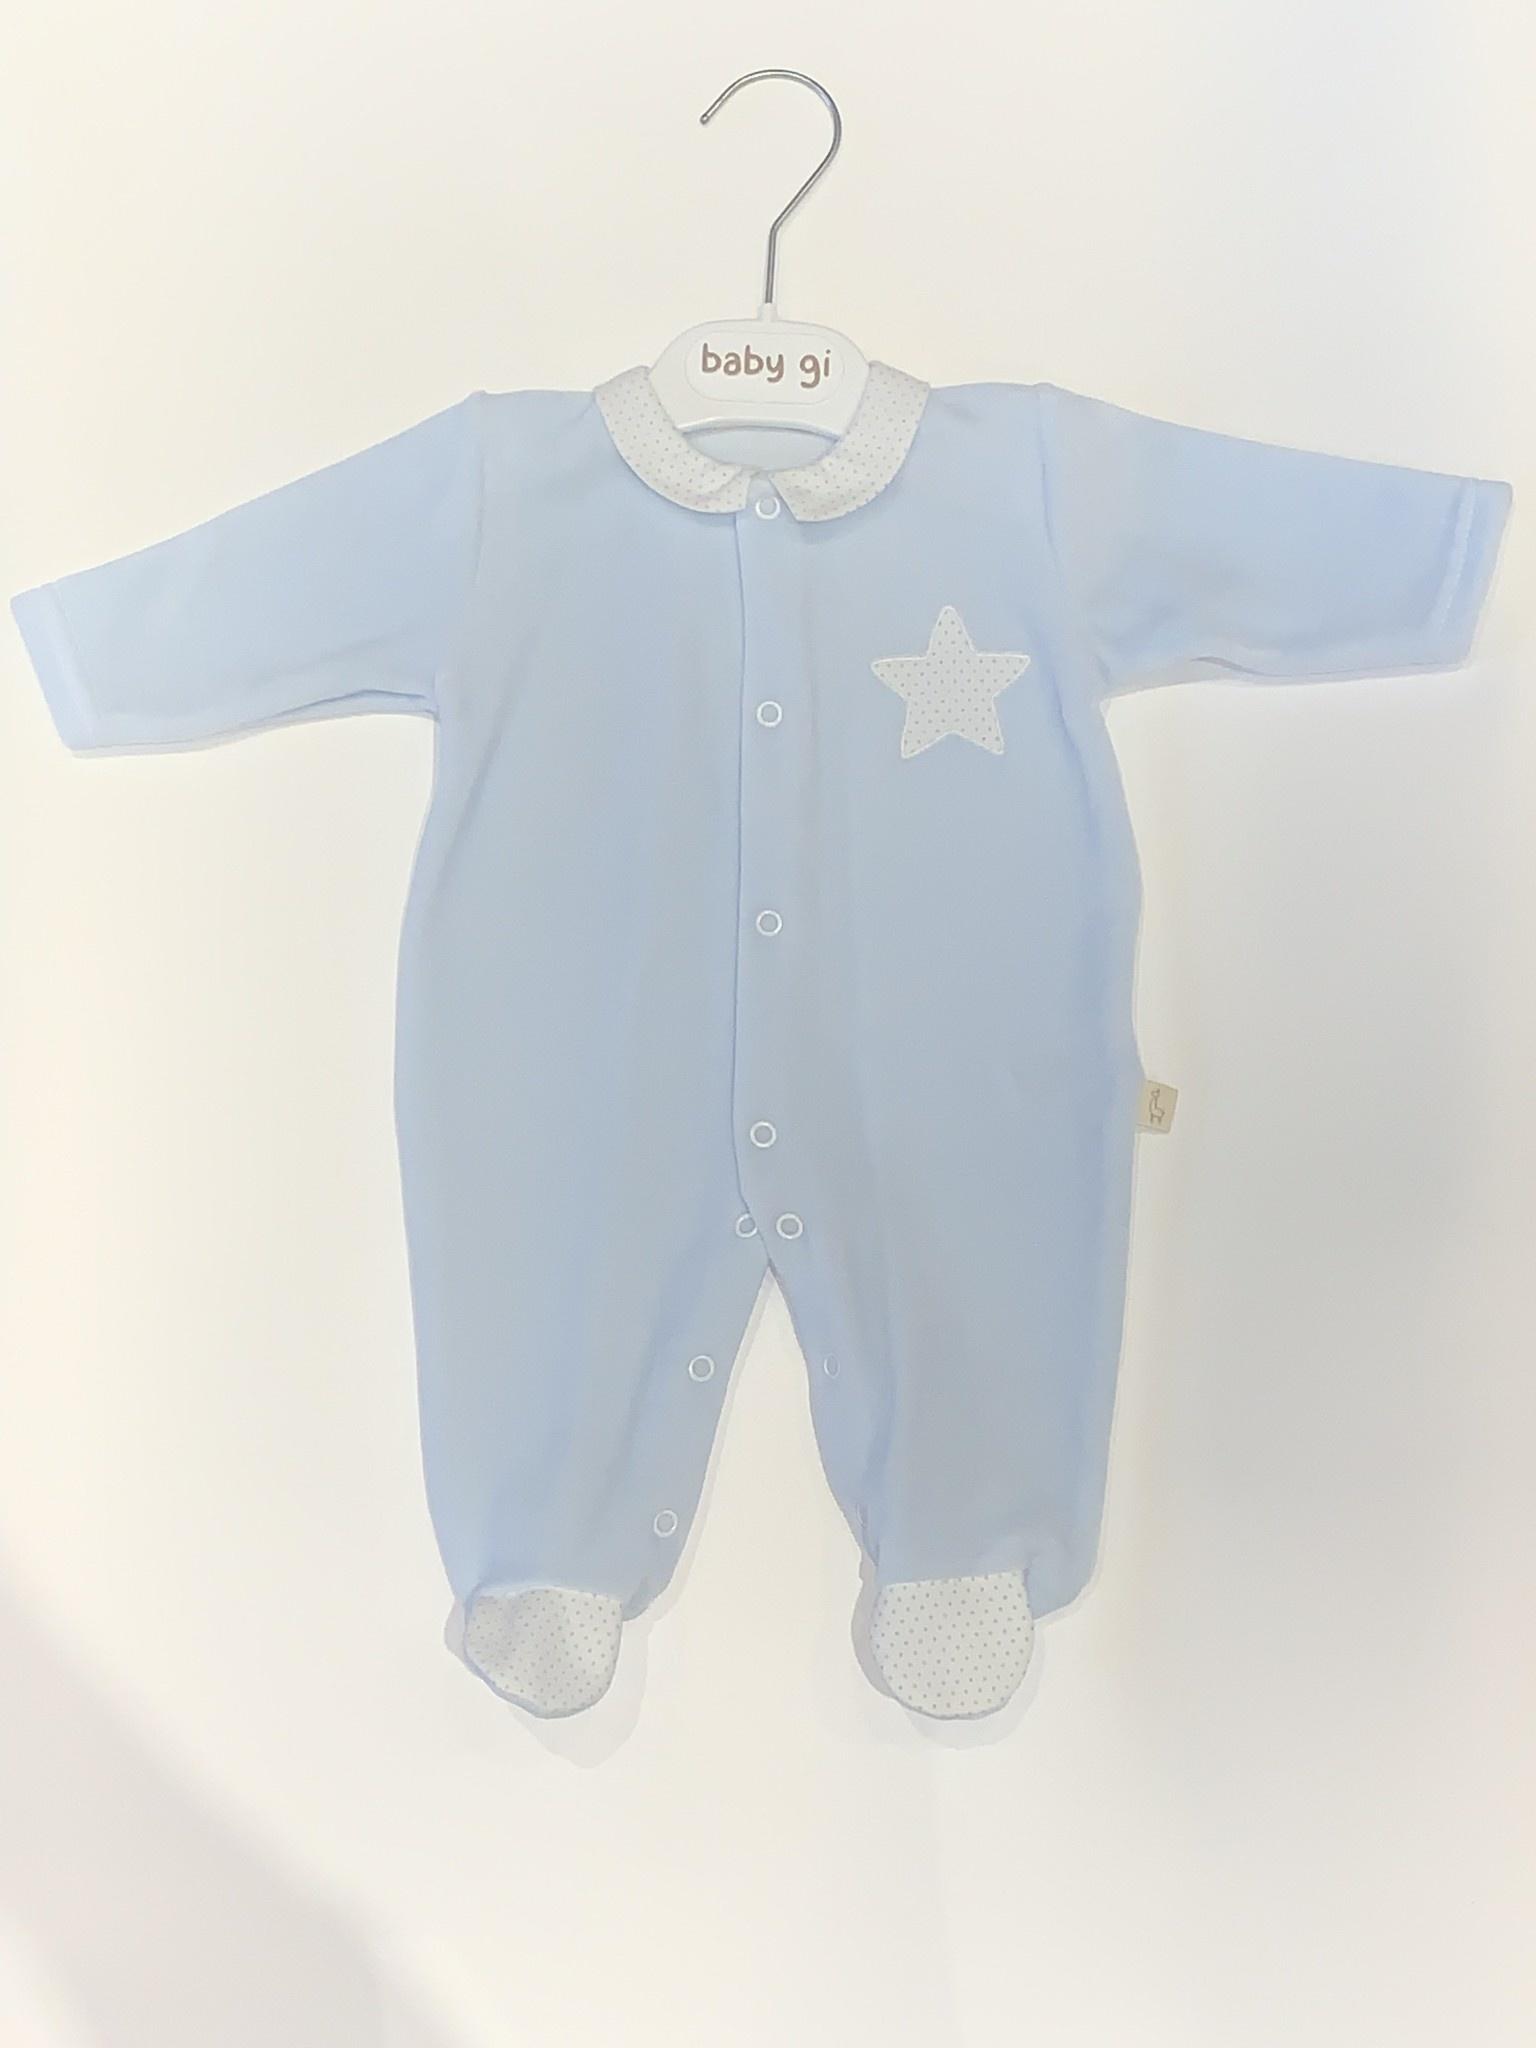 Baby Gi Baby gi blue velour star babygrow